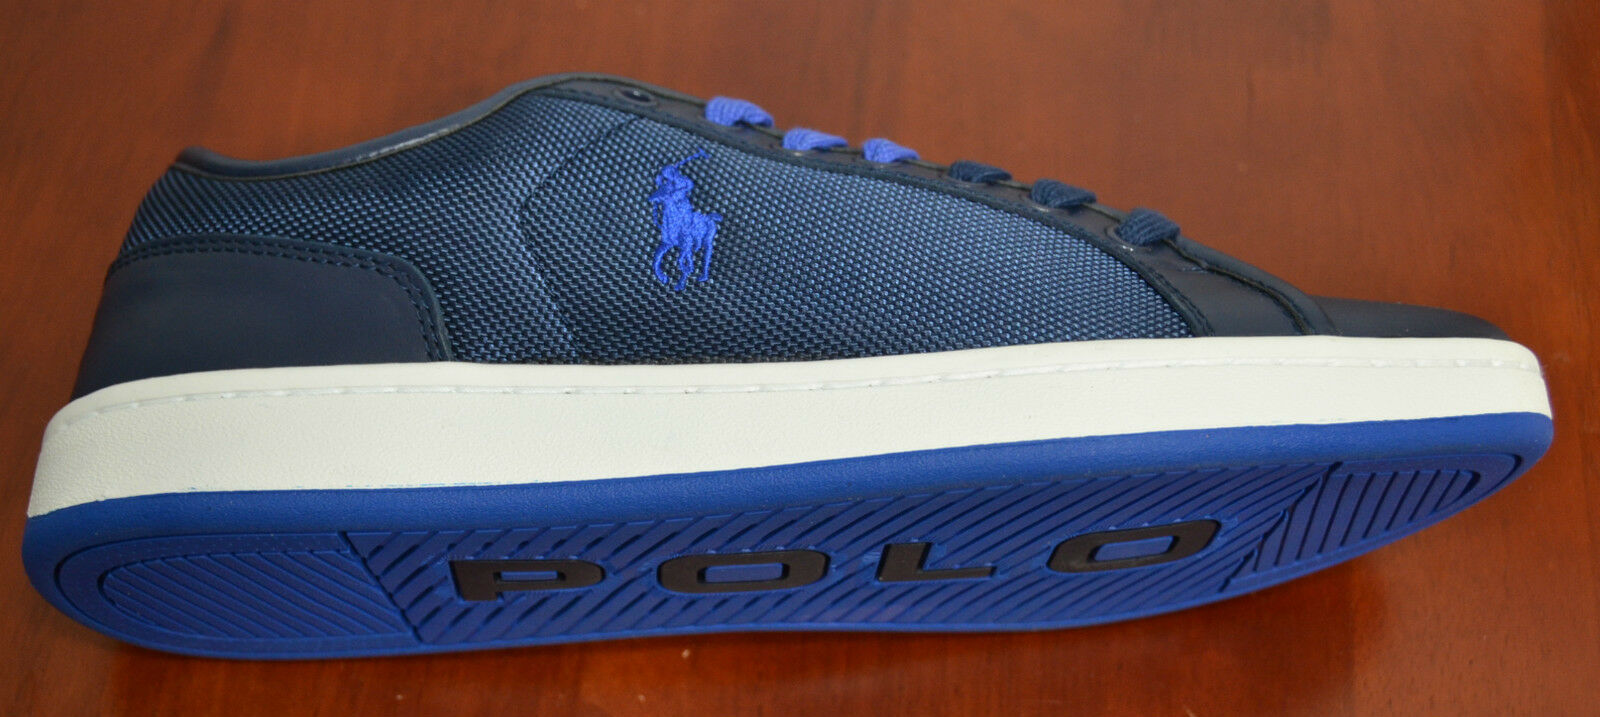 Polo Ralph Lauren Men TREVOSE LOW Sneakers Shoes Navy 10, 10.5